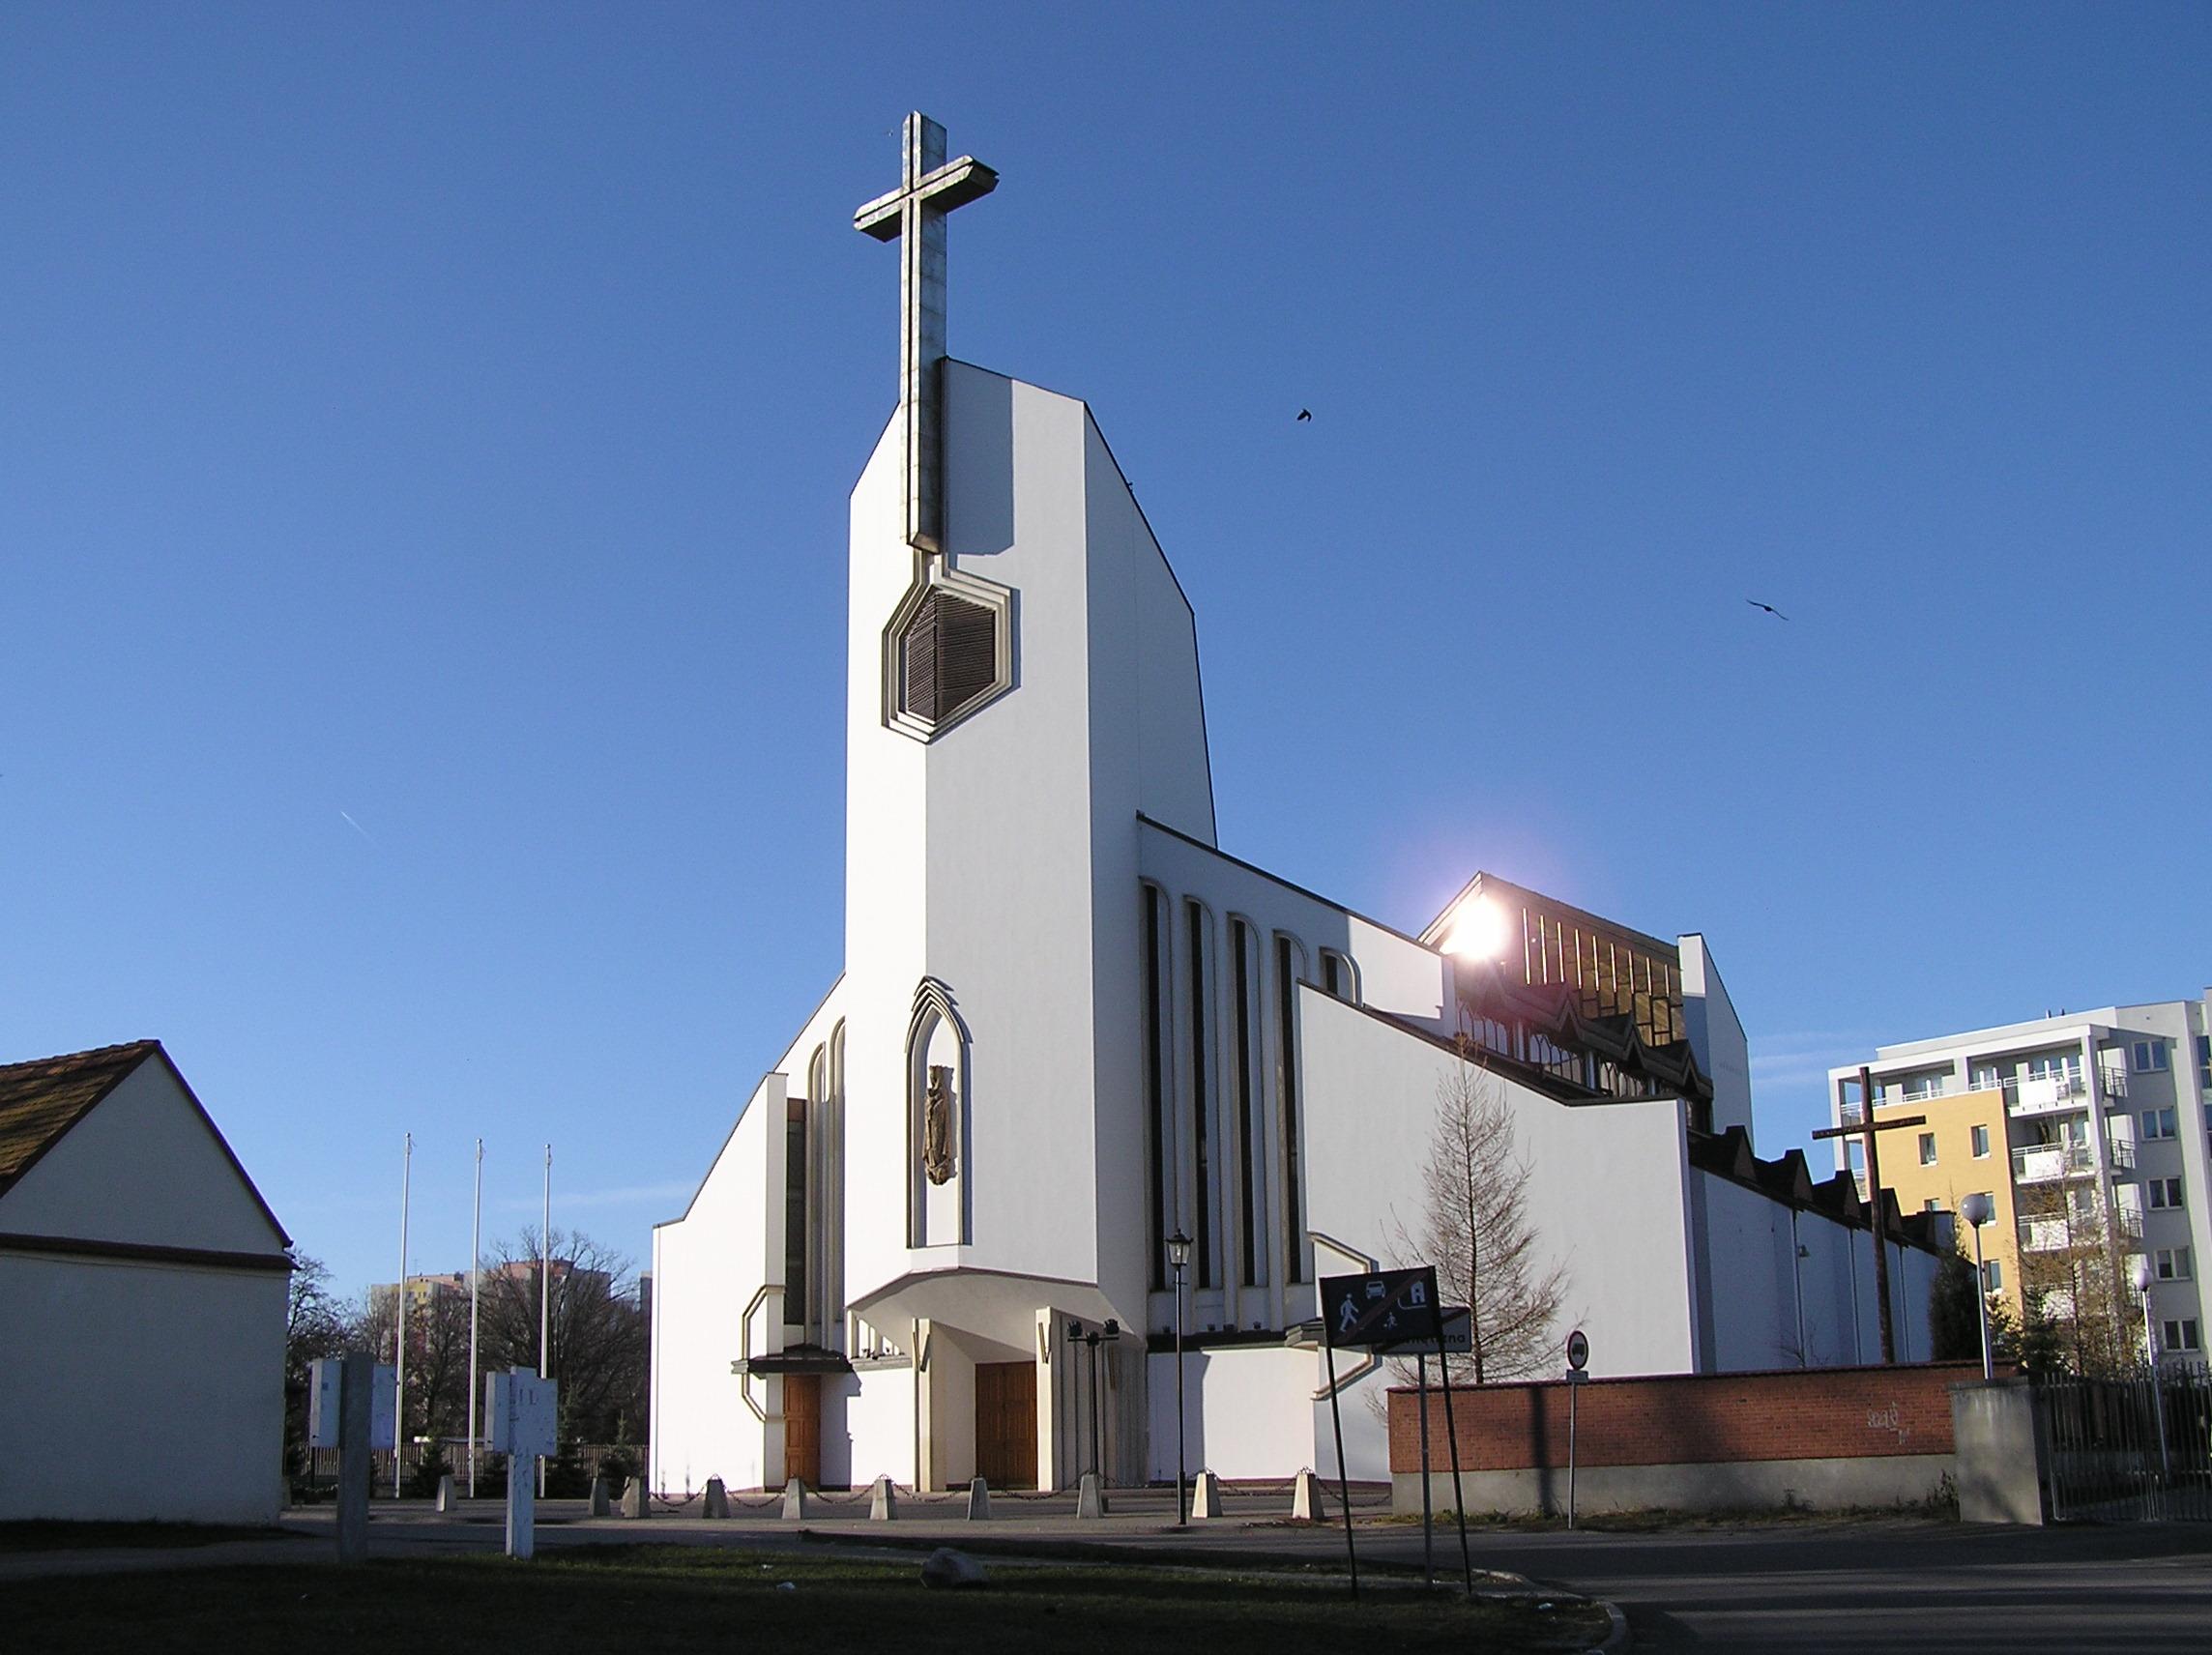 Churches Cost Us Taxpayers $71 Billion Each Year